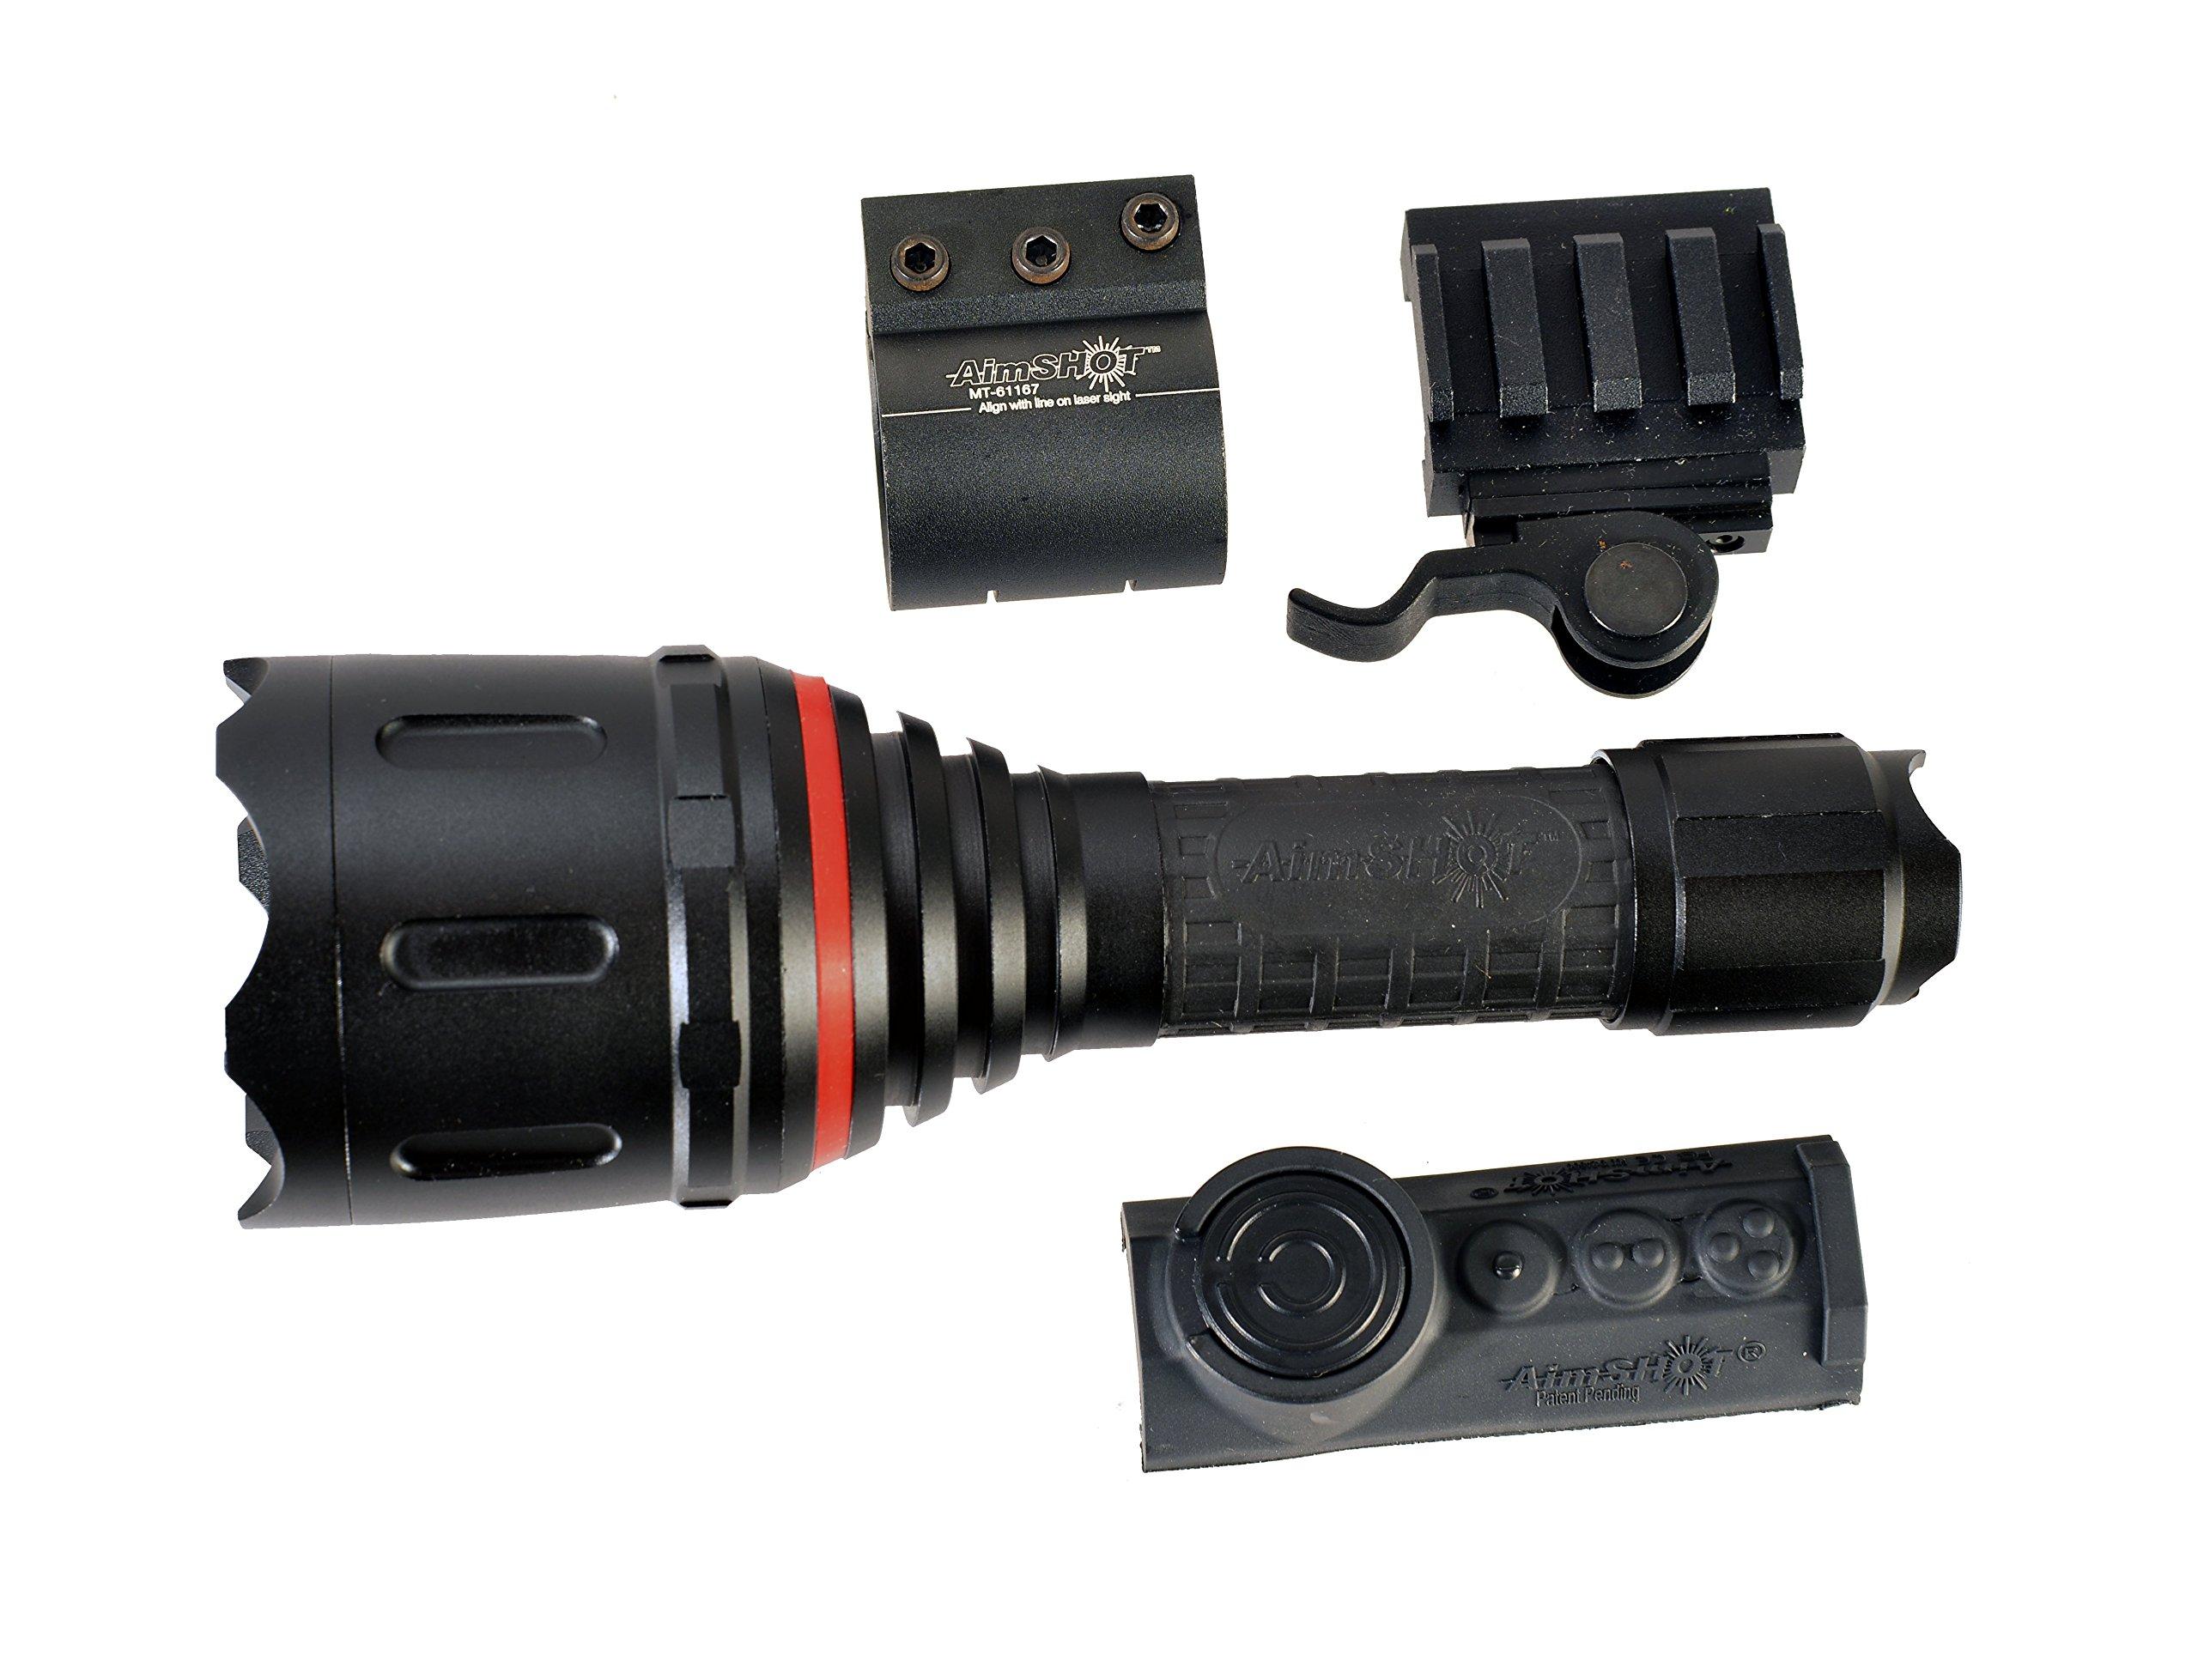 Aimshot TZ980-IR Adjustable Beam Wireless IR Flashlight Kit, Black